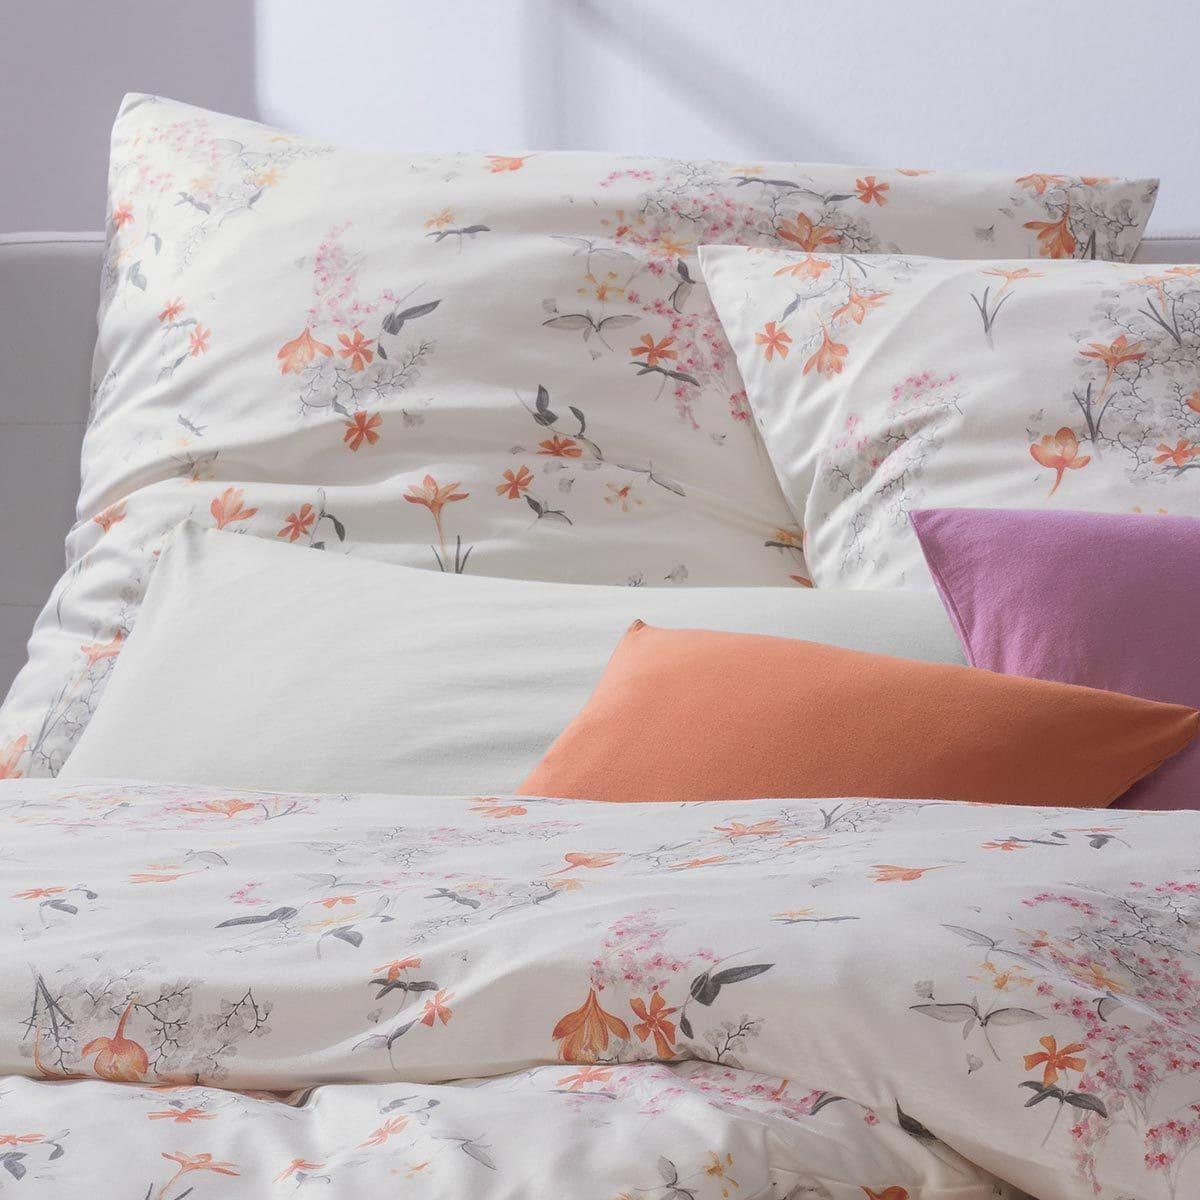 estella mako interlock jersey marisa apricot g nstig online kaufen bei bettwaren shop. Black Bedroom Furniture Sets. Home Design Ideas